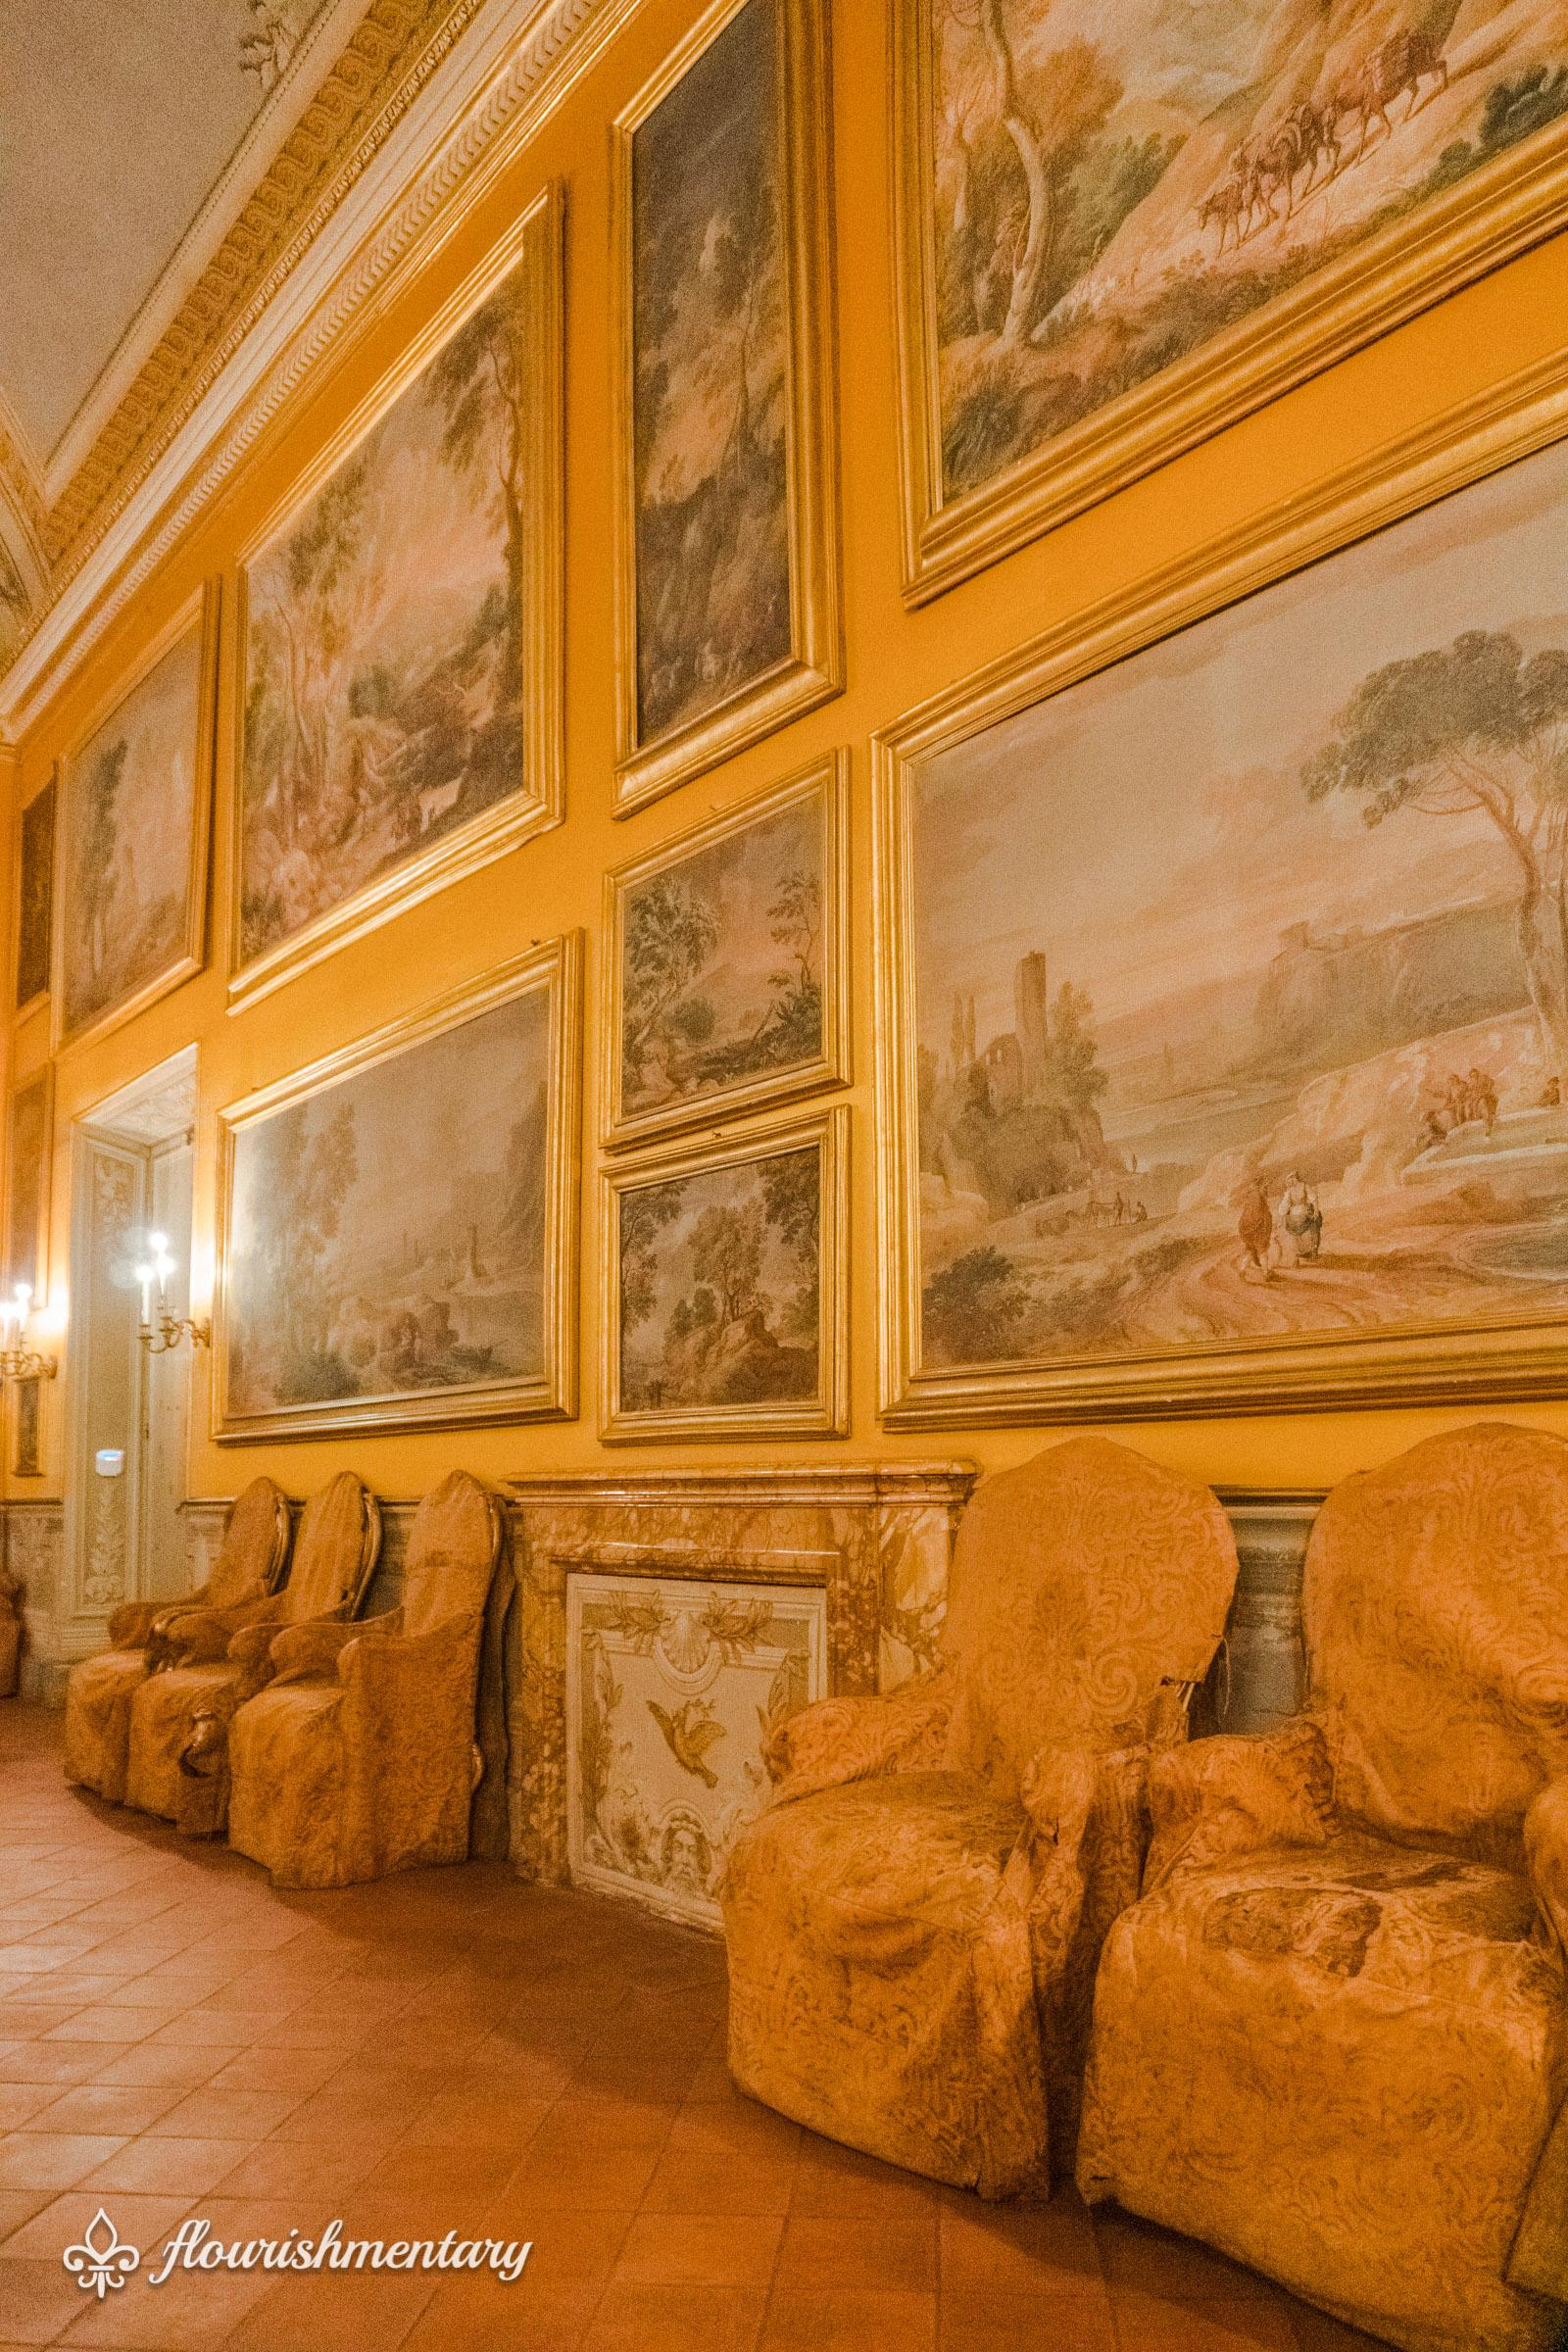 The popes throne room galleria doria pamphilj